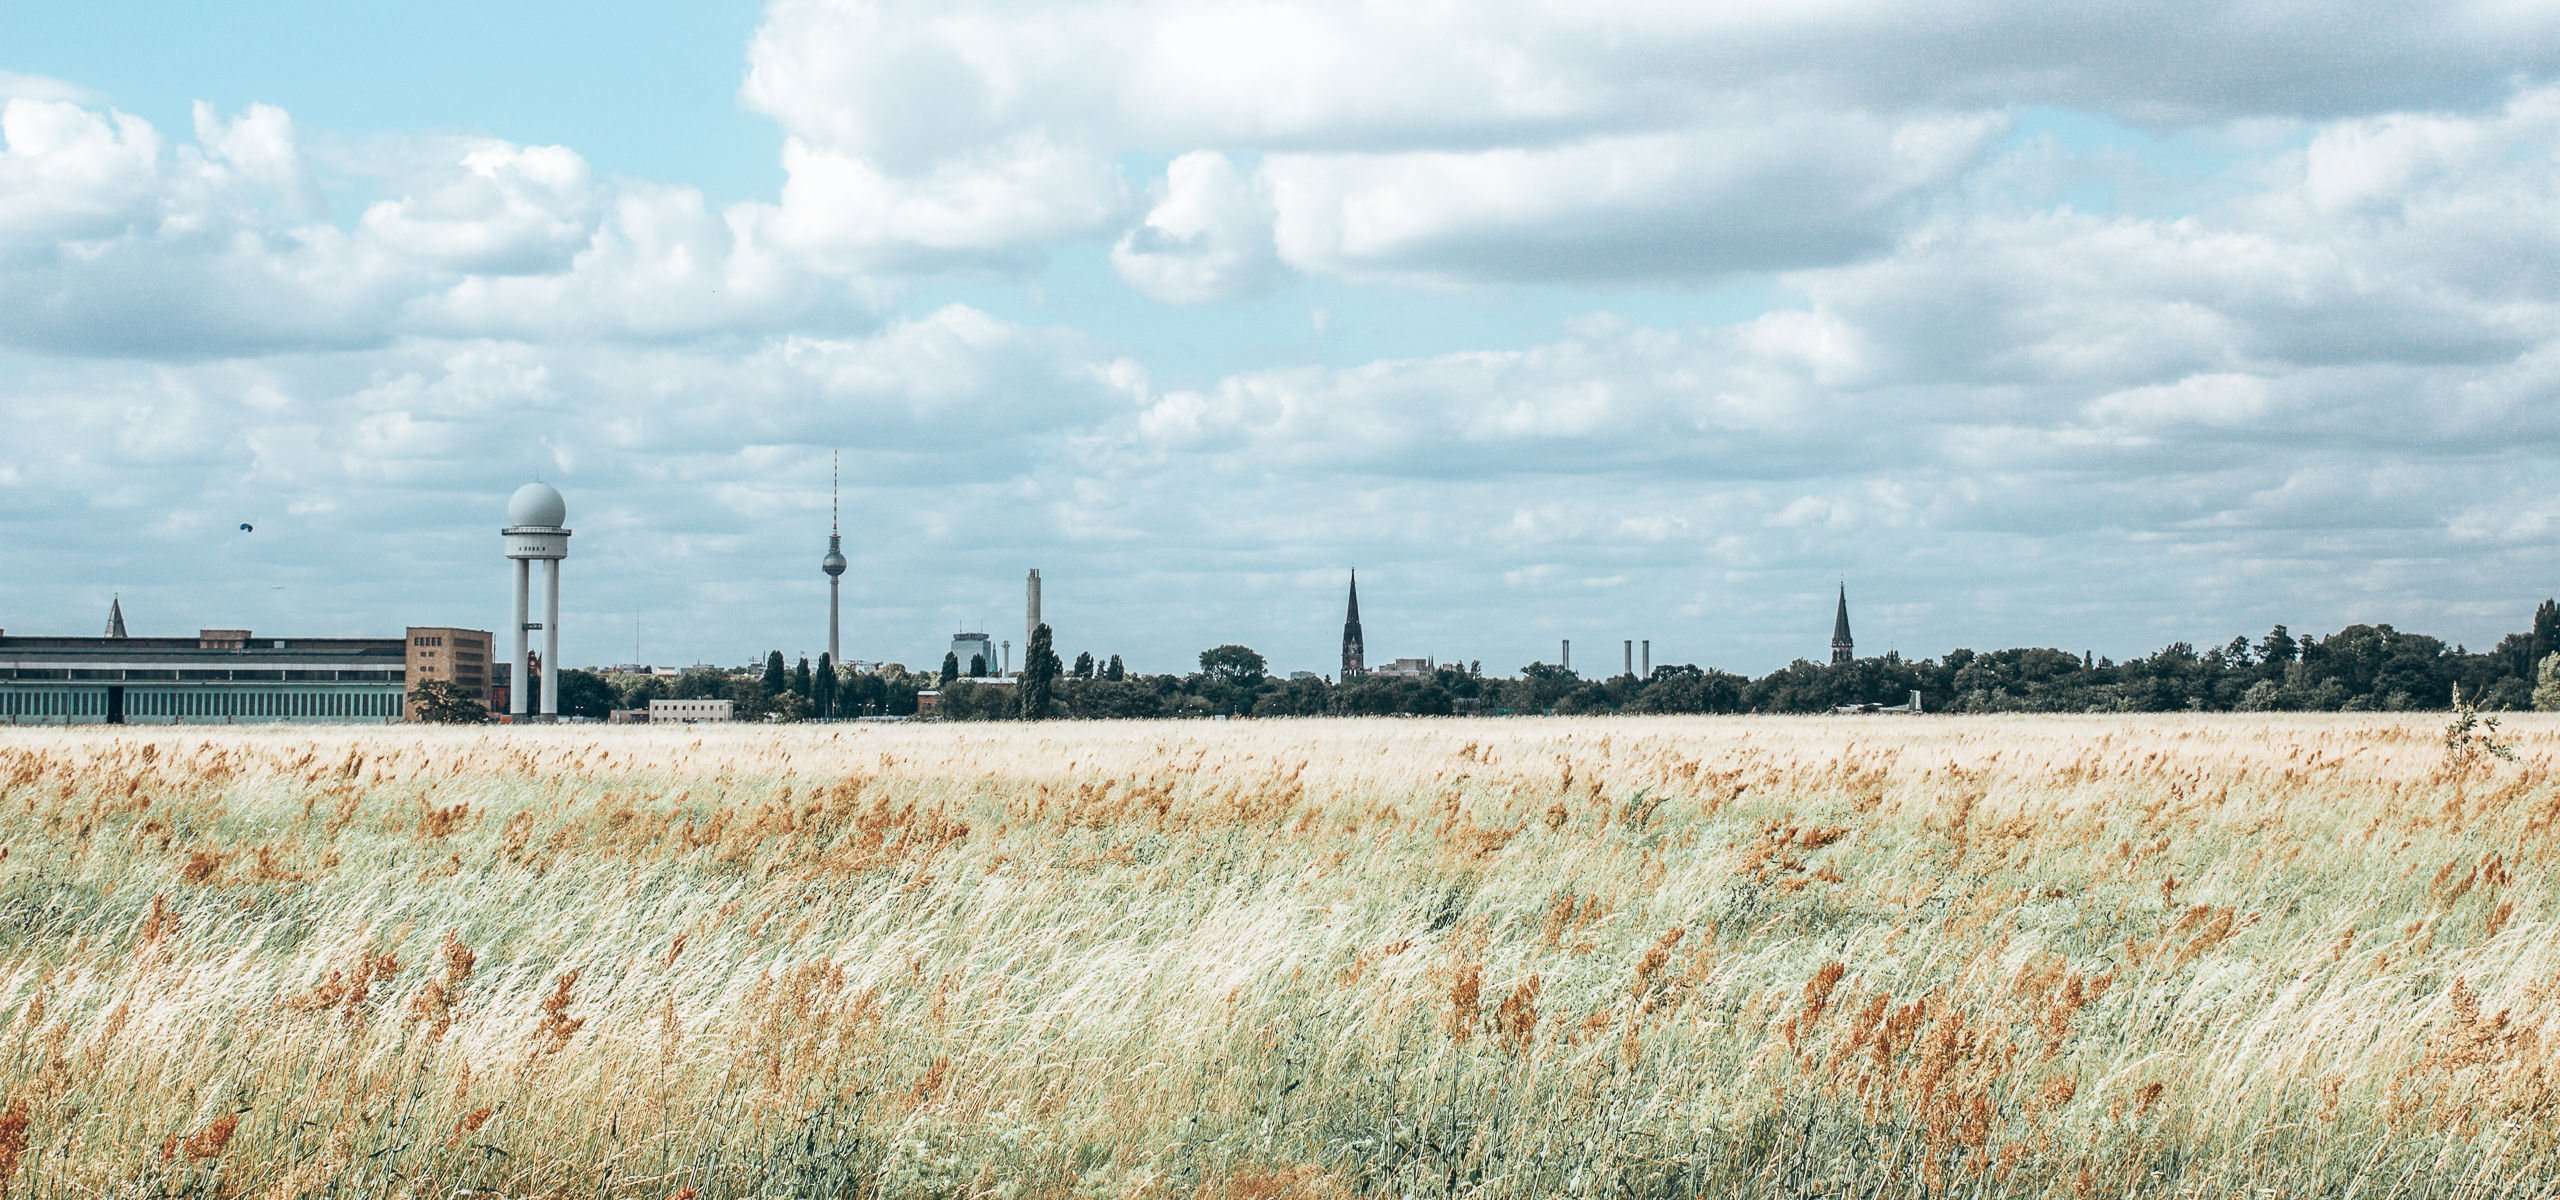 The Alternative Berlin City Guide